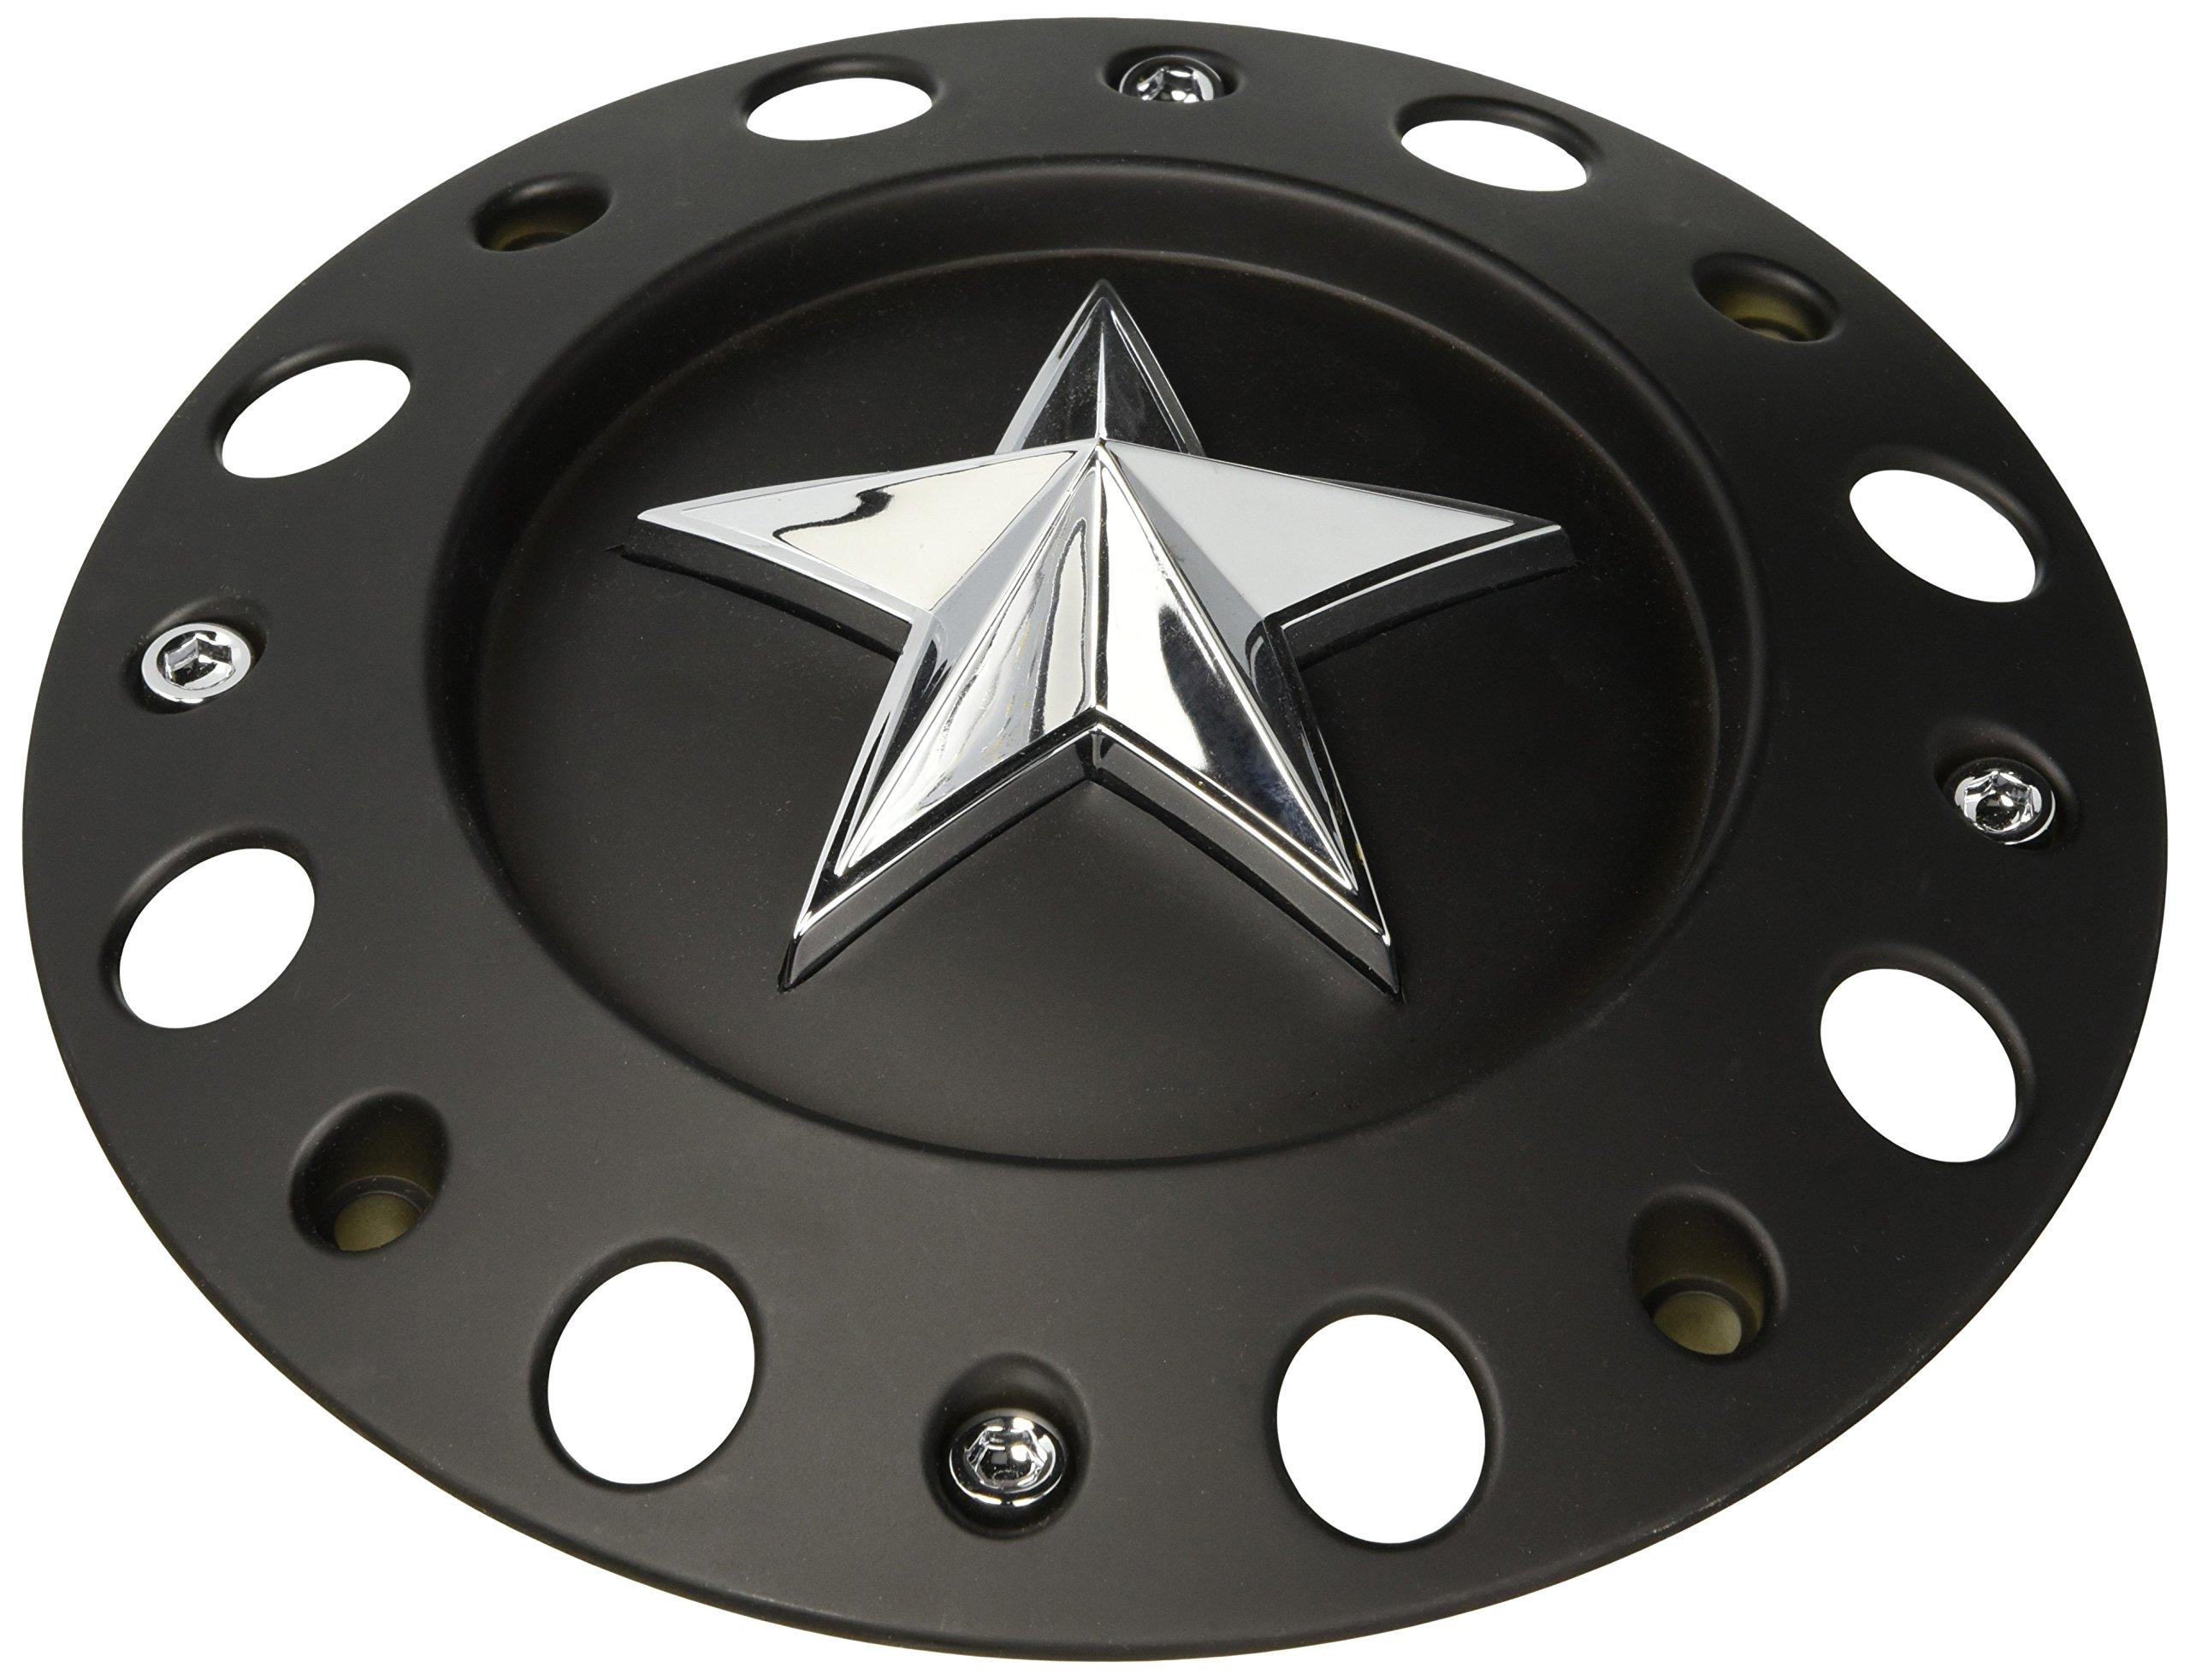 KMC-XD-SERIES-775L239B-Rockstar-Dually-Center-Cap